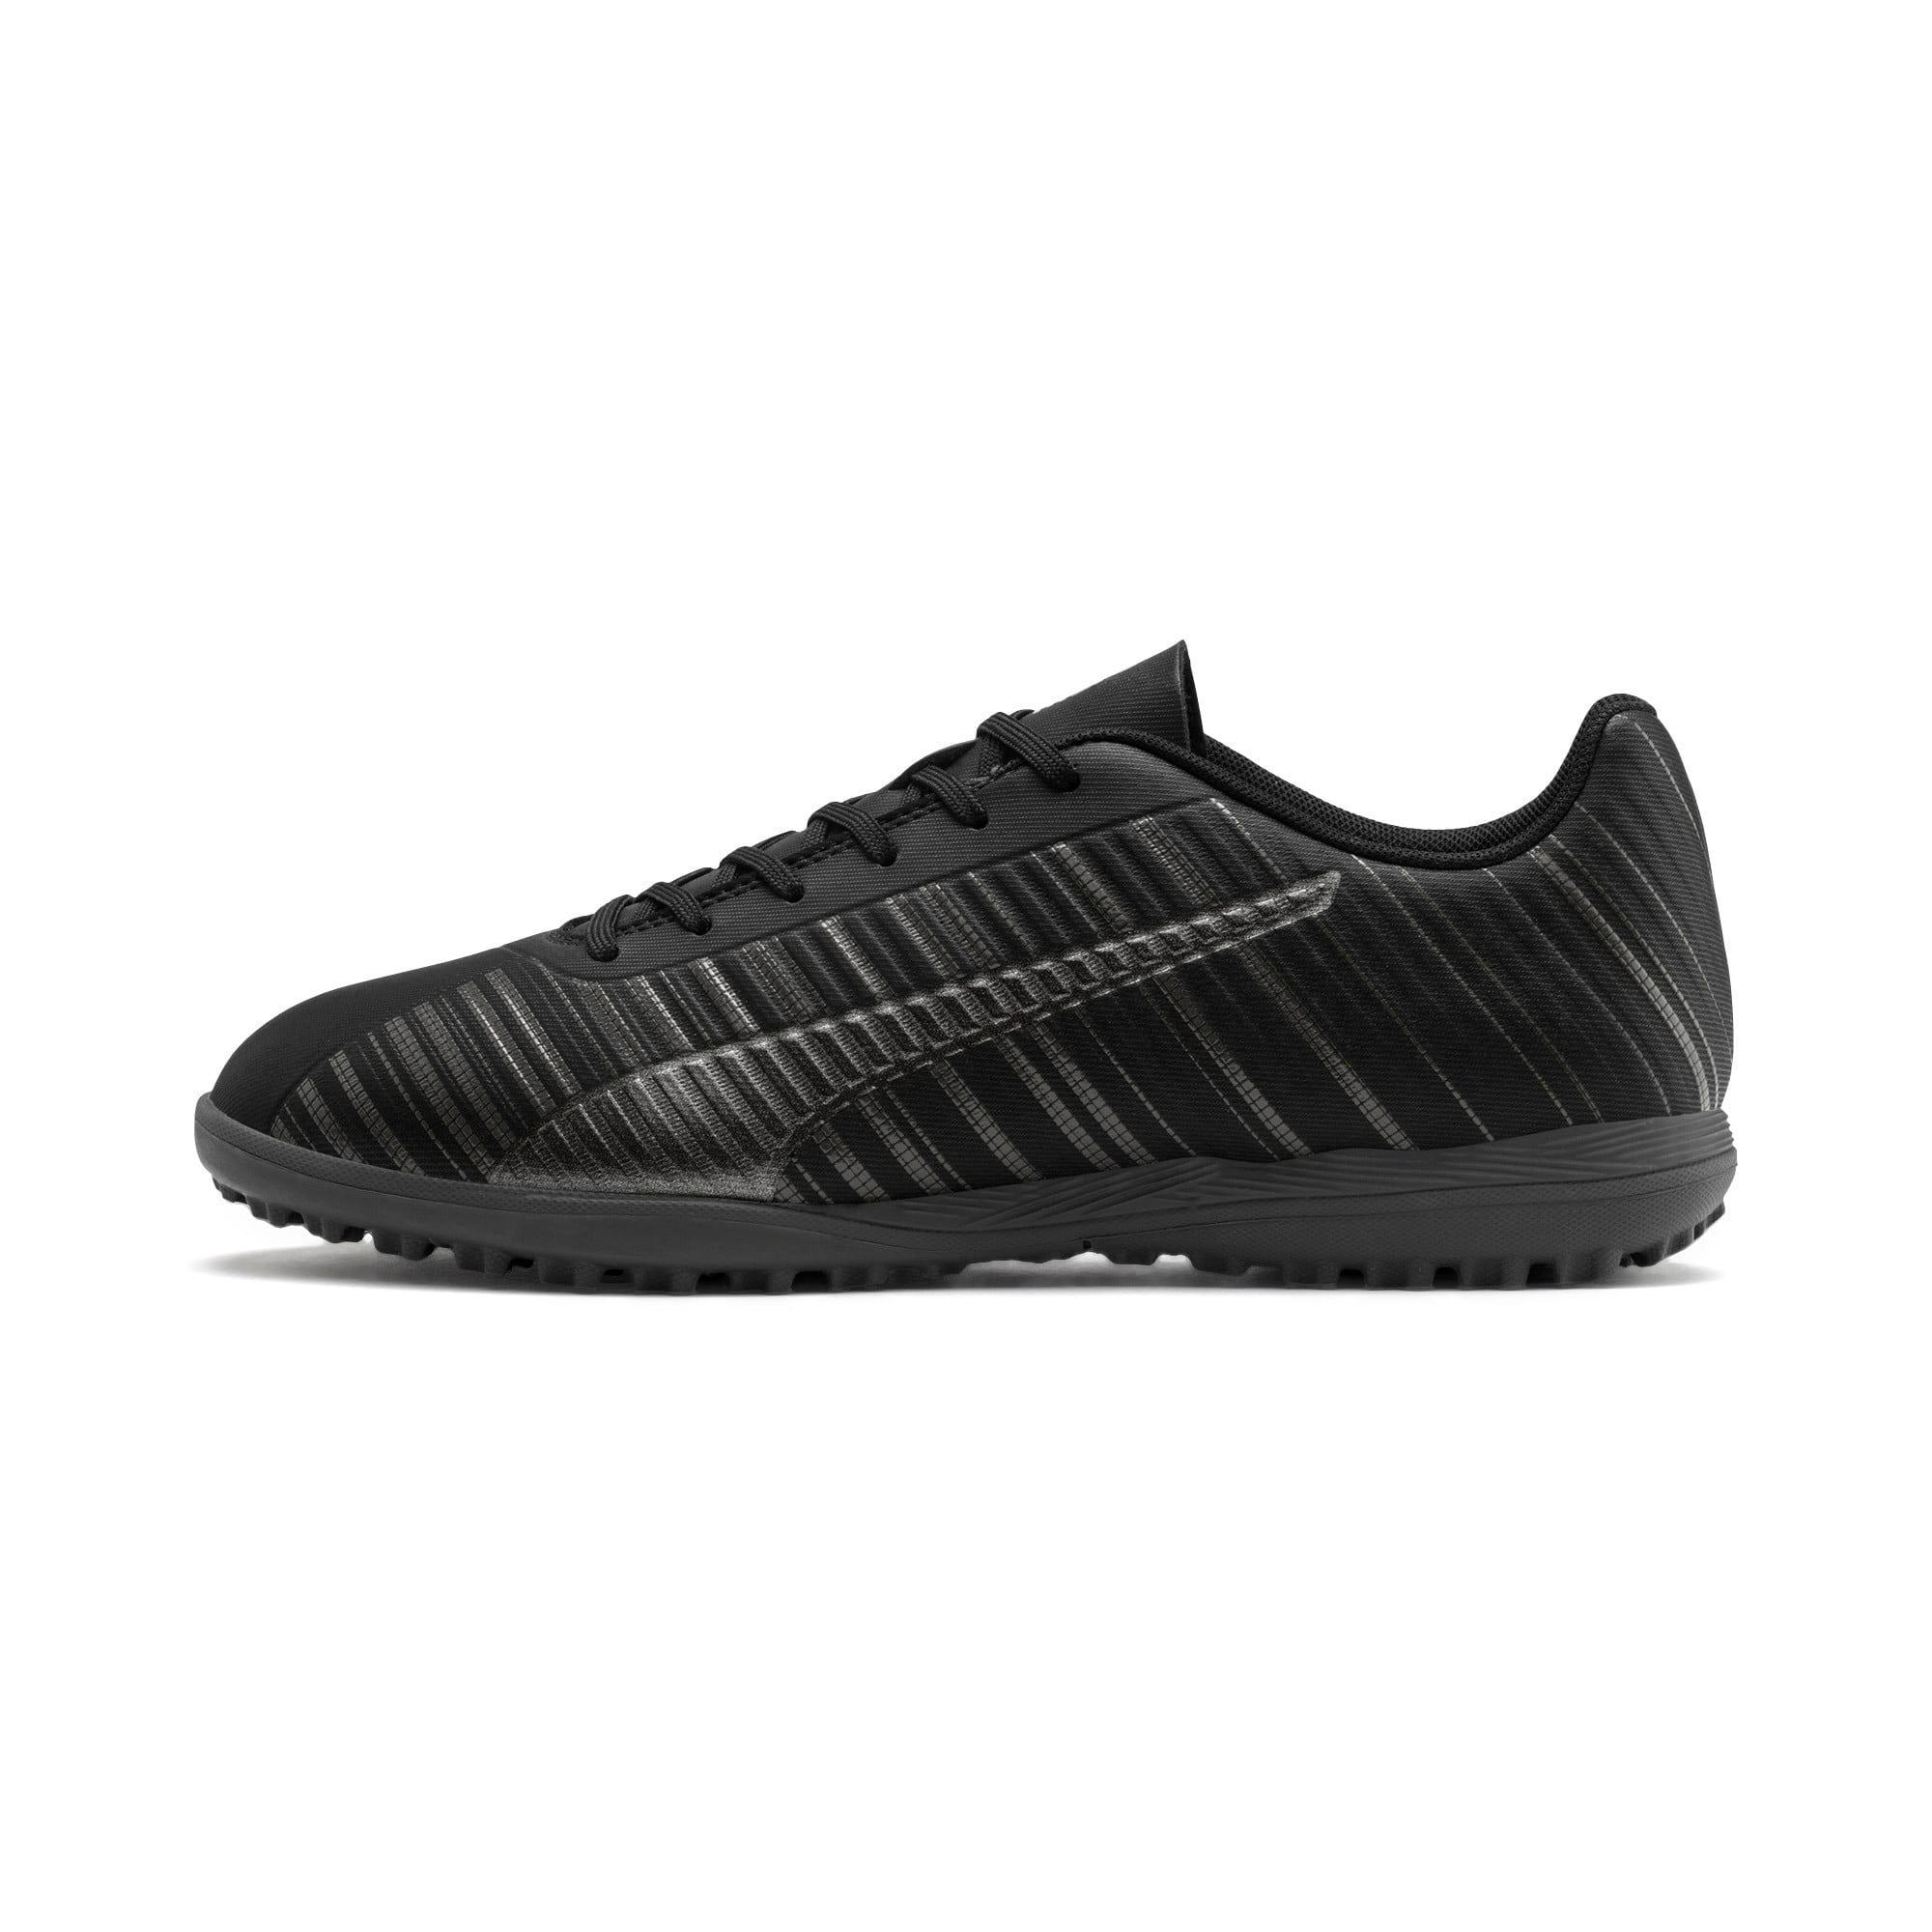 Thumbnail 1 of PUMA ONE 5.4 TT Men's Soccer Shoes, Black-Black-Puma Aged Silver, medium